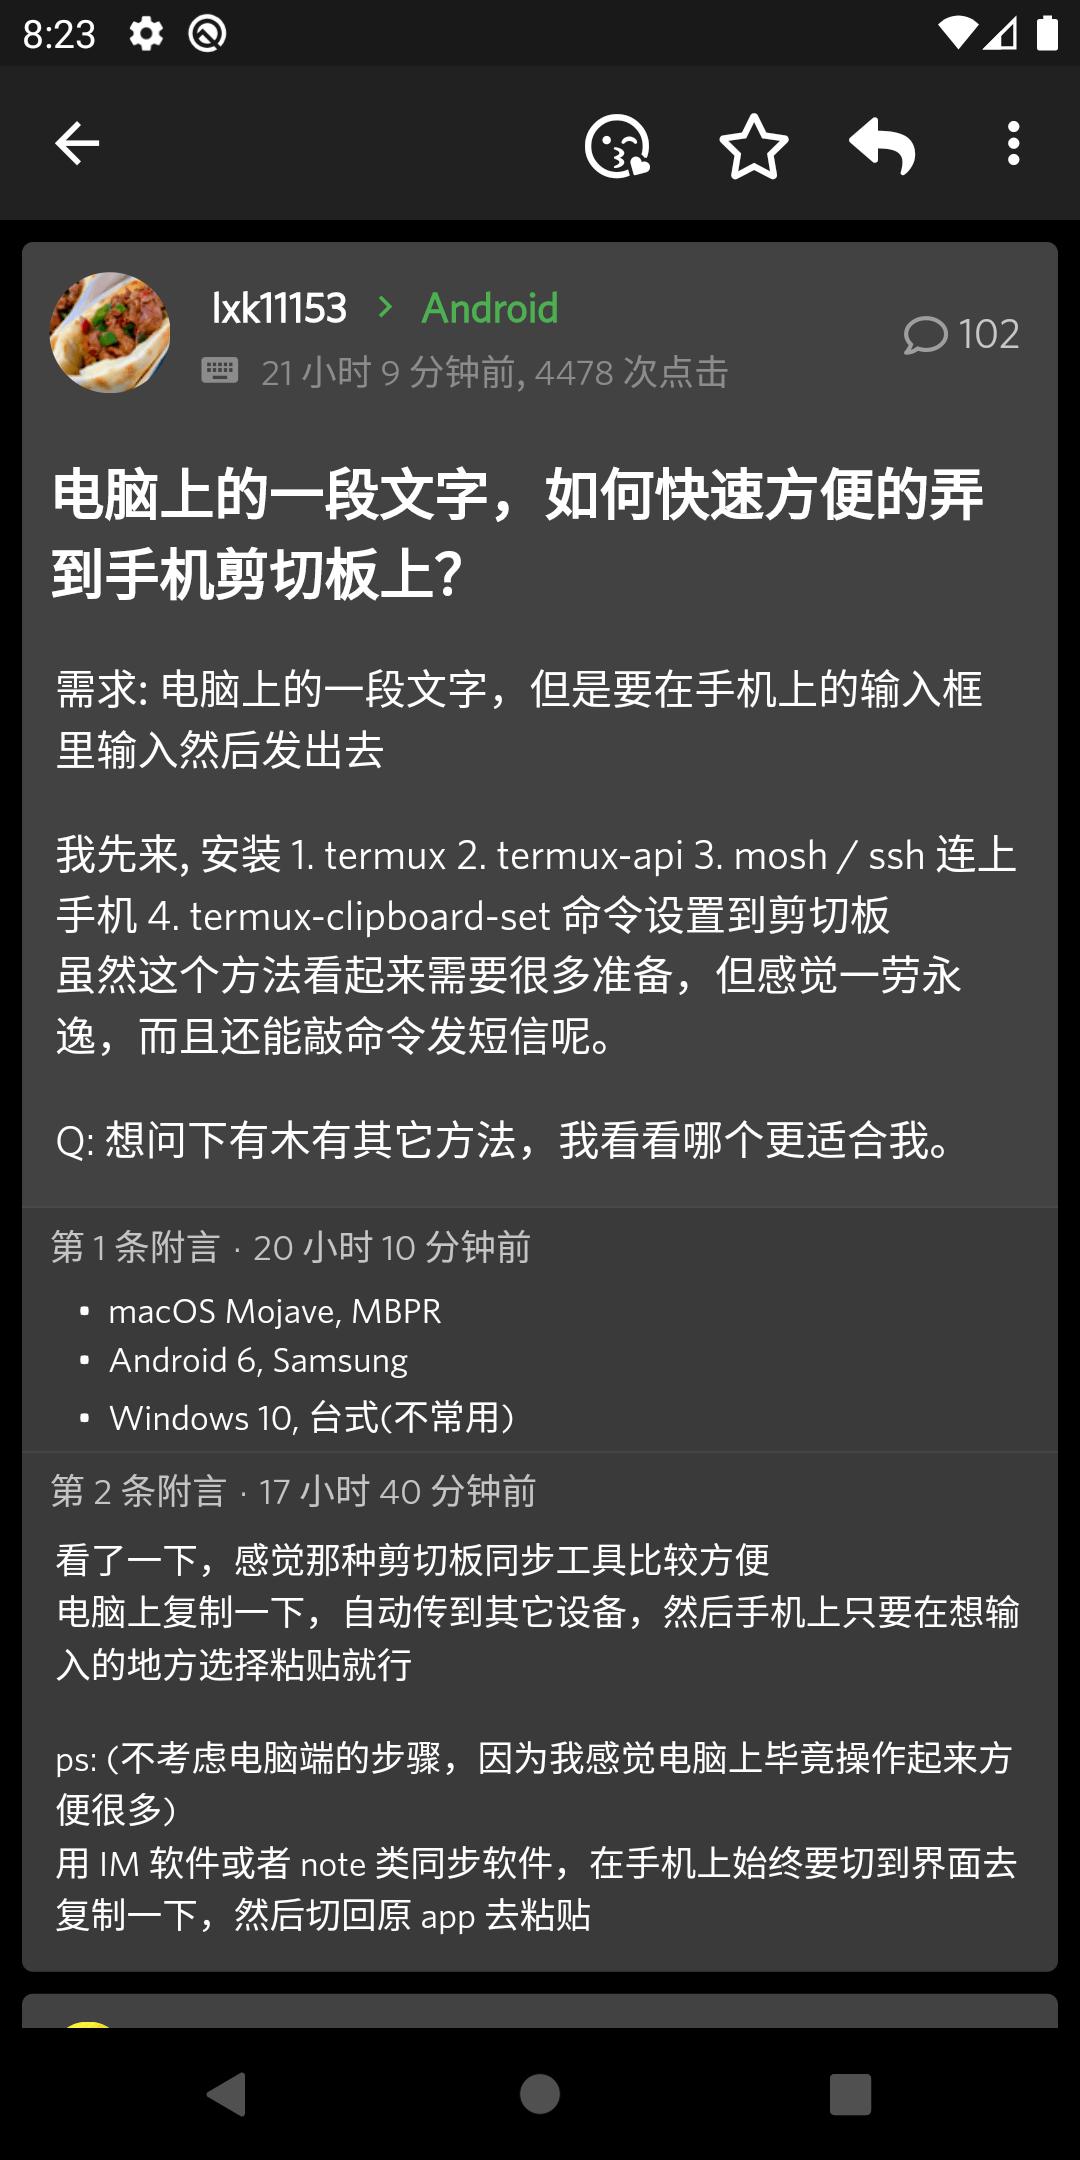 Screenshot_1572049387.png